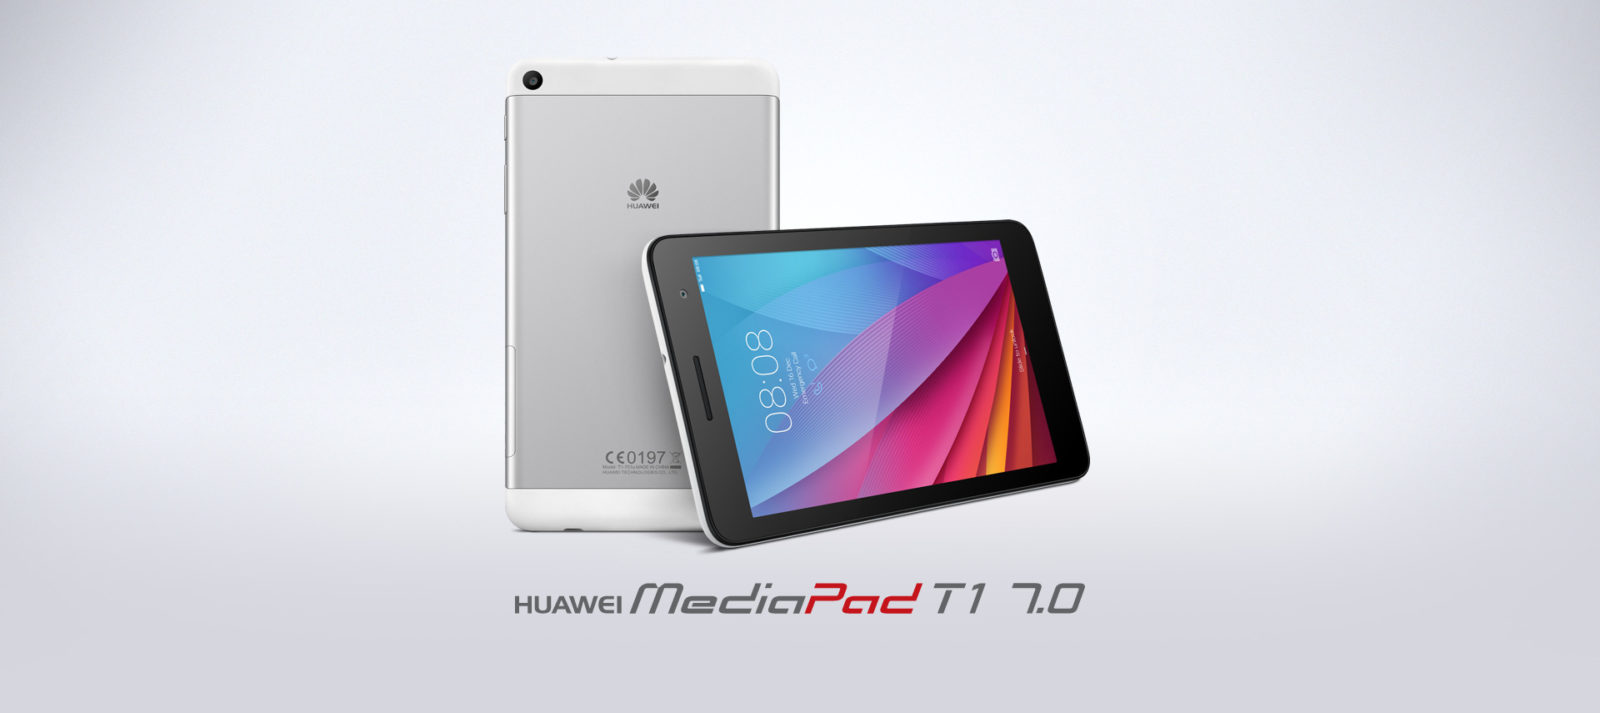 Huawei tablet Mediapad, come sono i tre nuovi device in arrivo